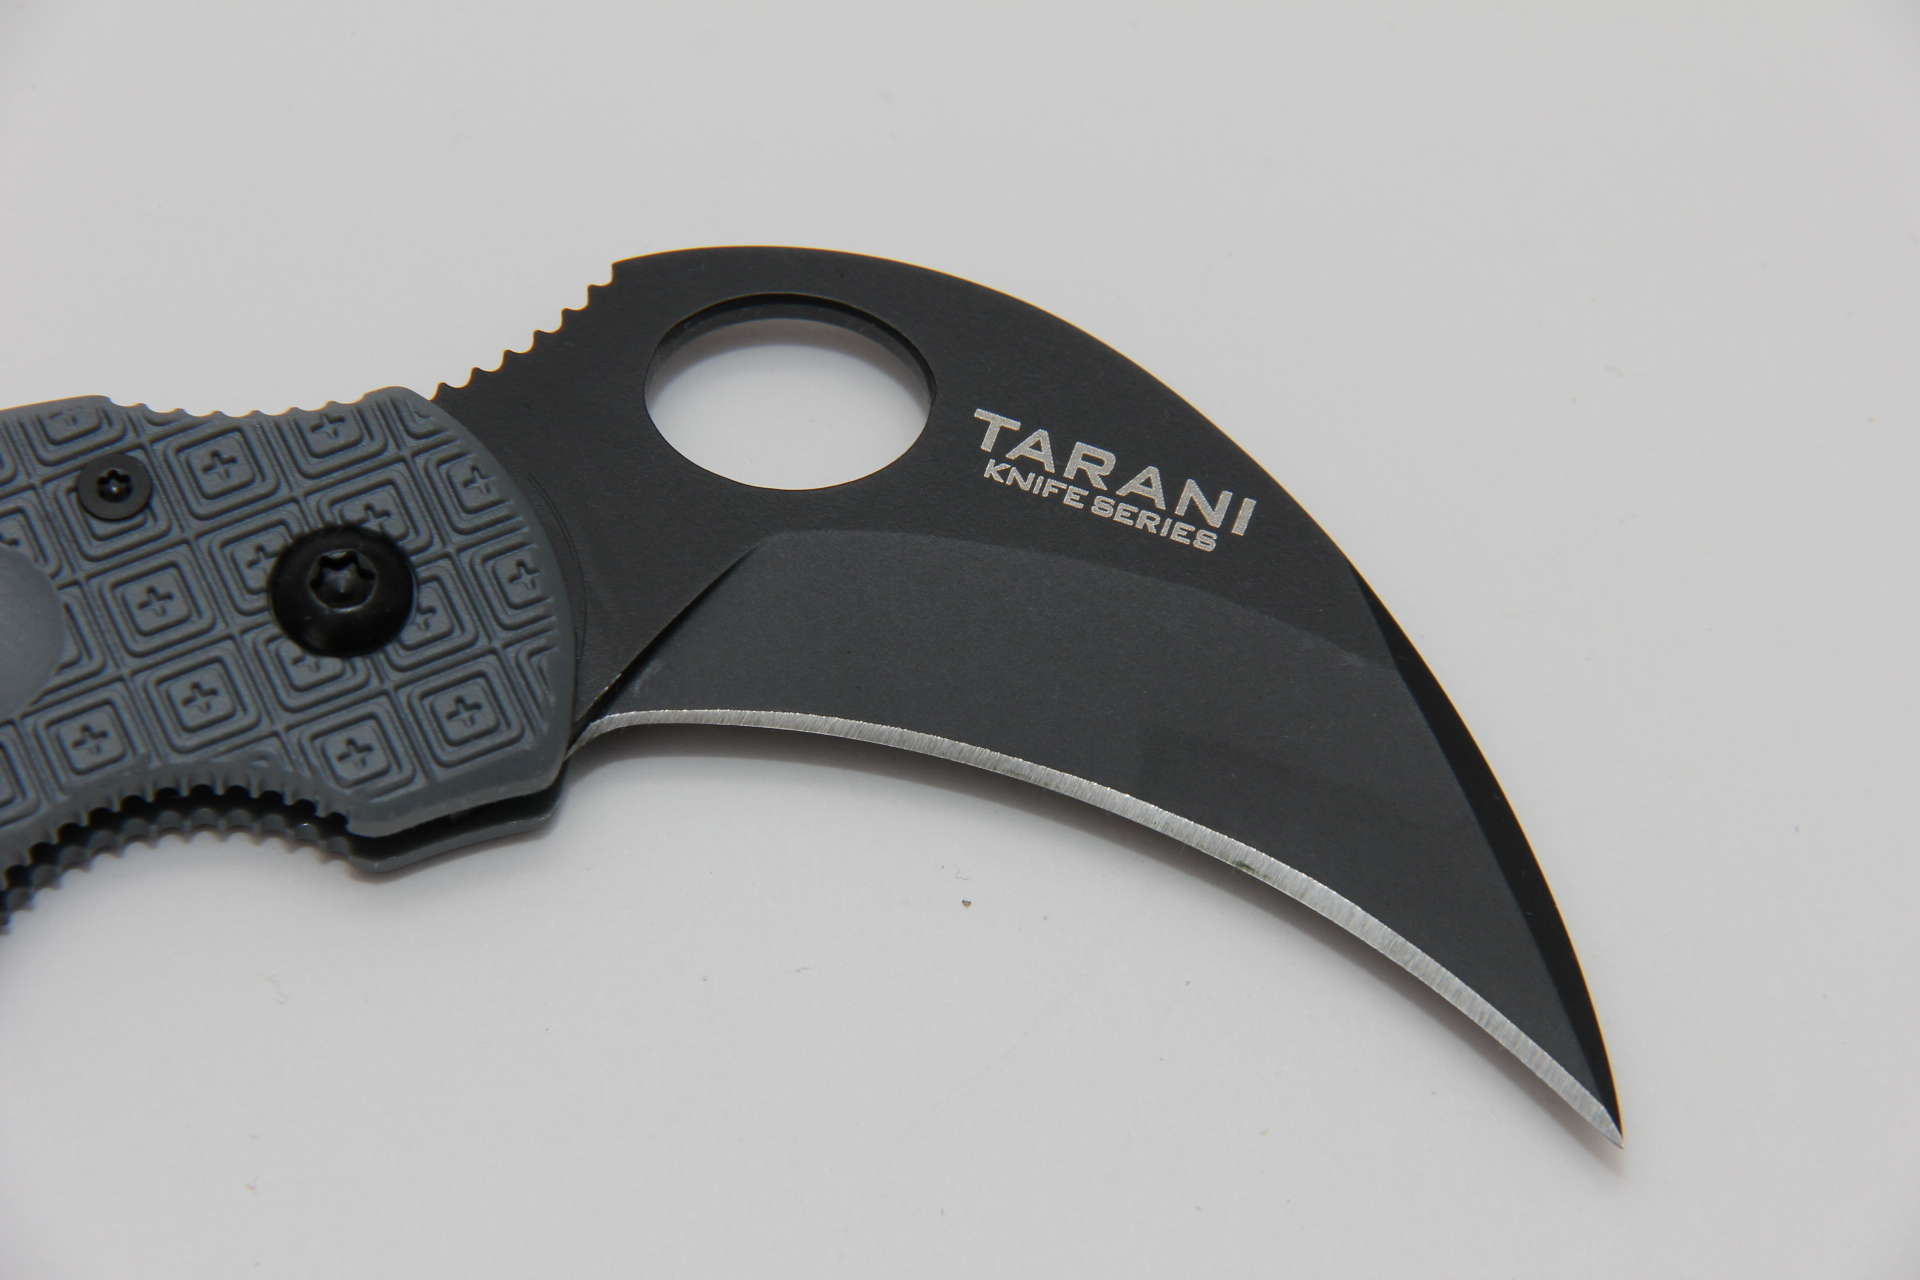 Нож Керамбит 5.11 C.U.B. Master 2.0 S30V 51048 - фотография